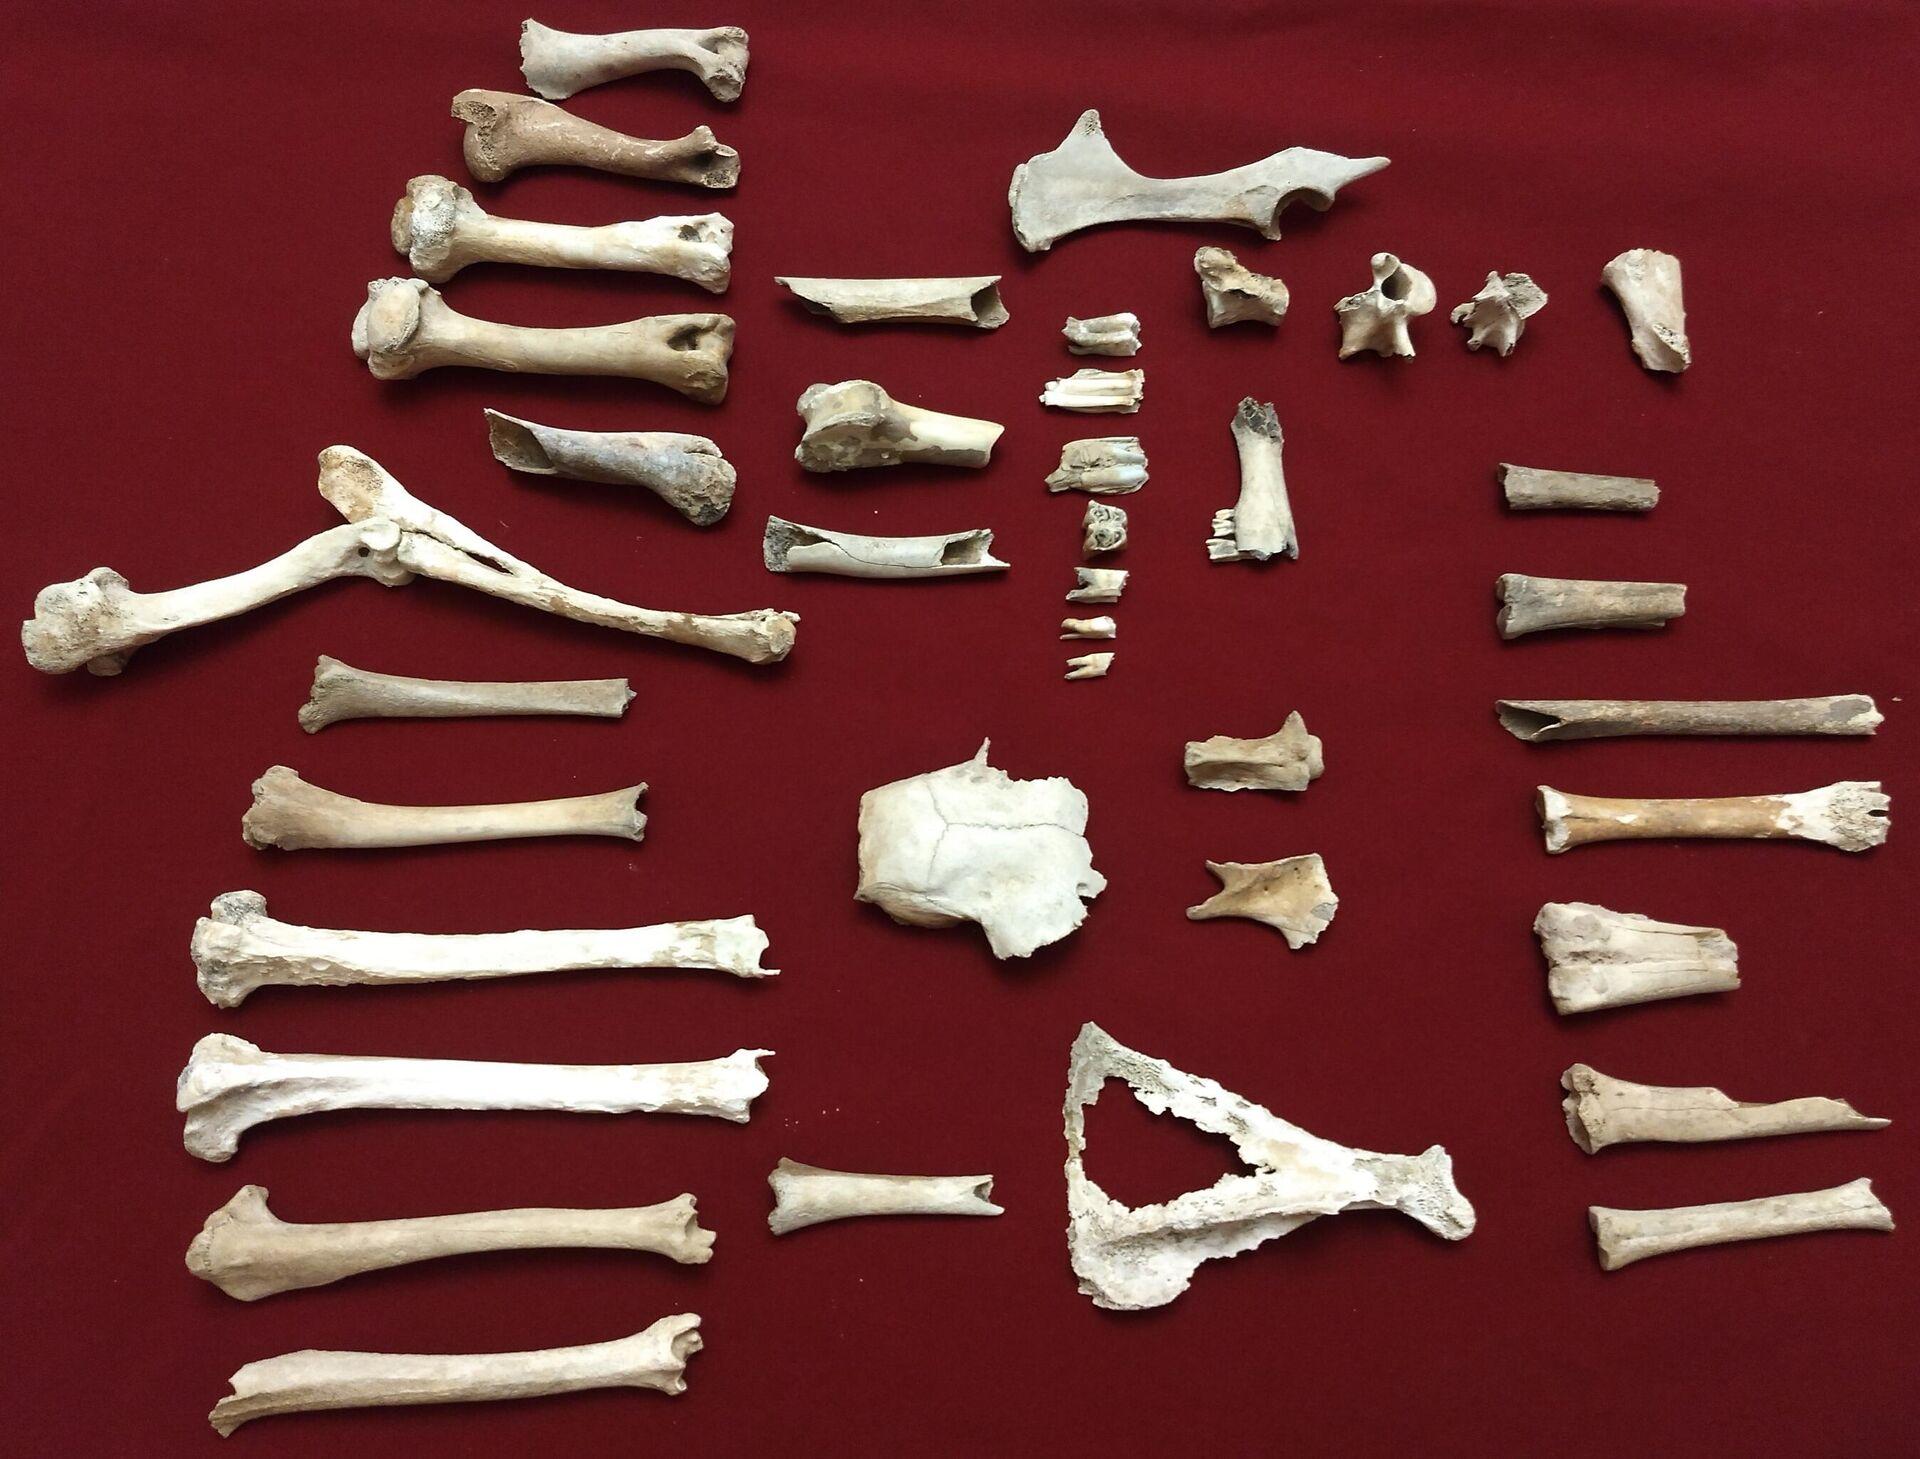 Restos óseos de seis ciervos prehistóricos hallados cerca de San Pedro, provincia de Buenos Aires, Argentina - Sputnik Mundo, 1920, 08.10.2021